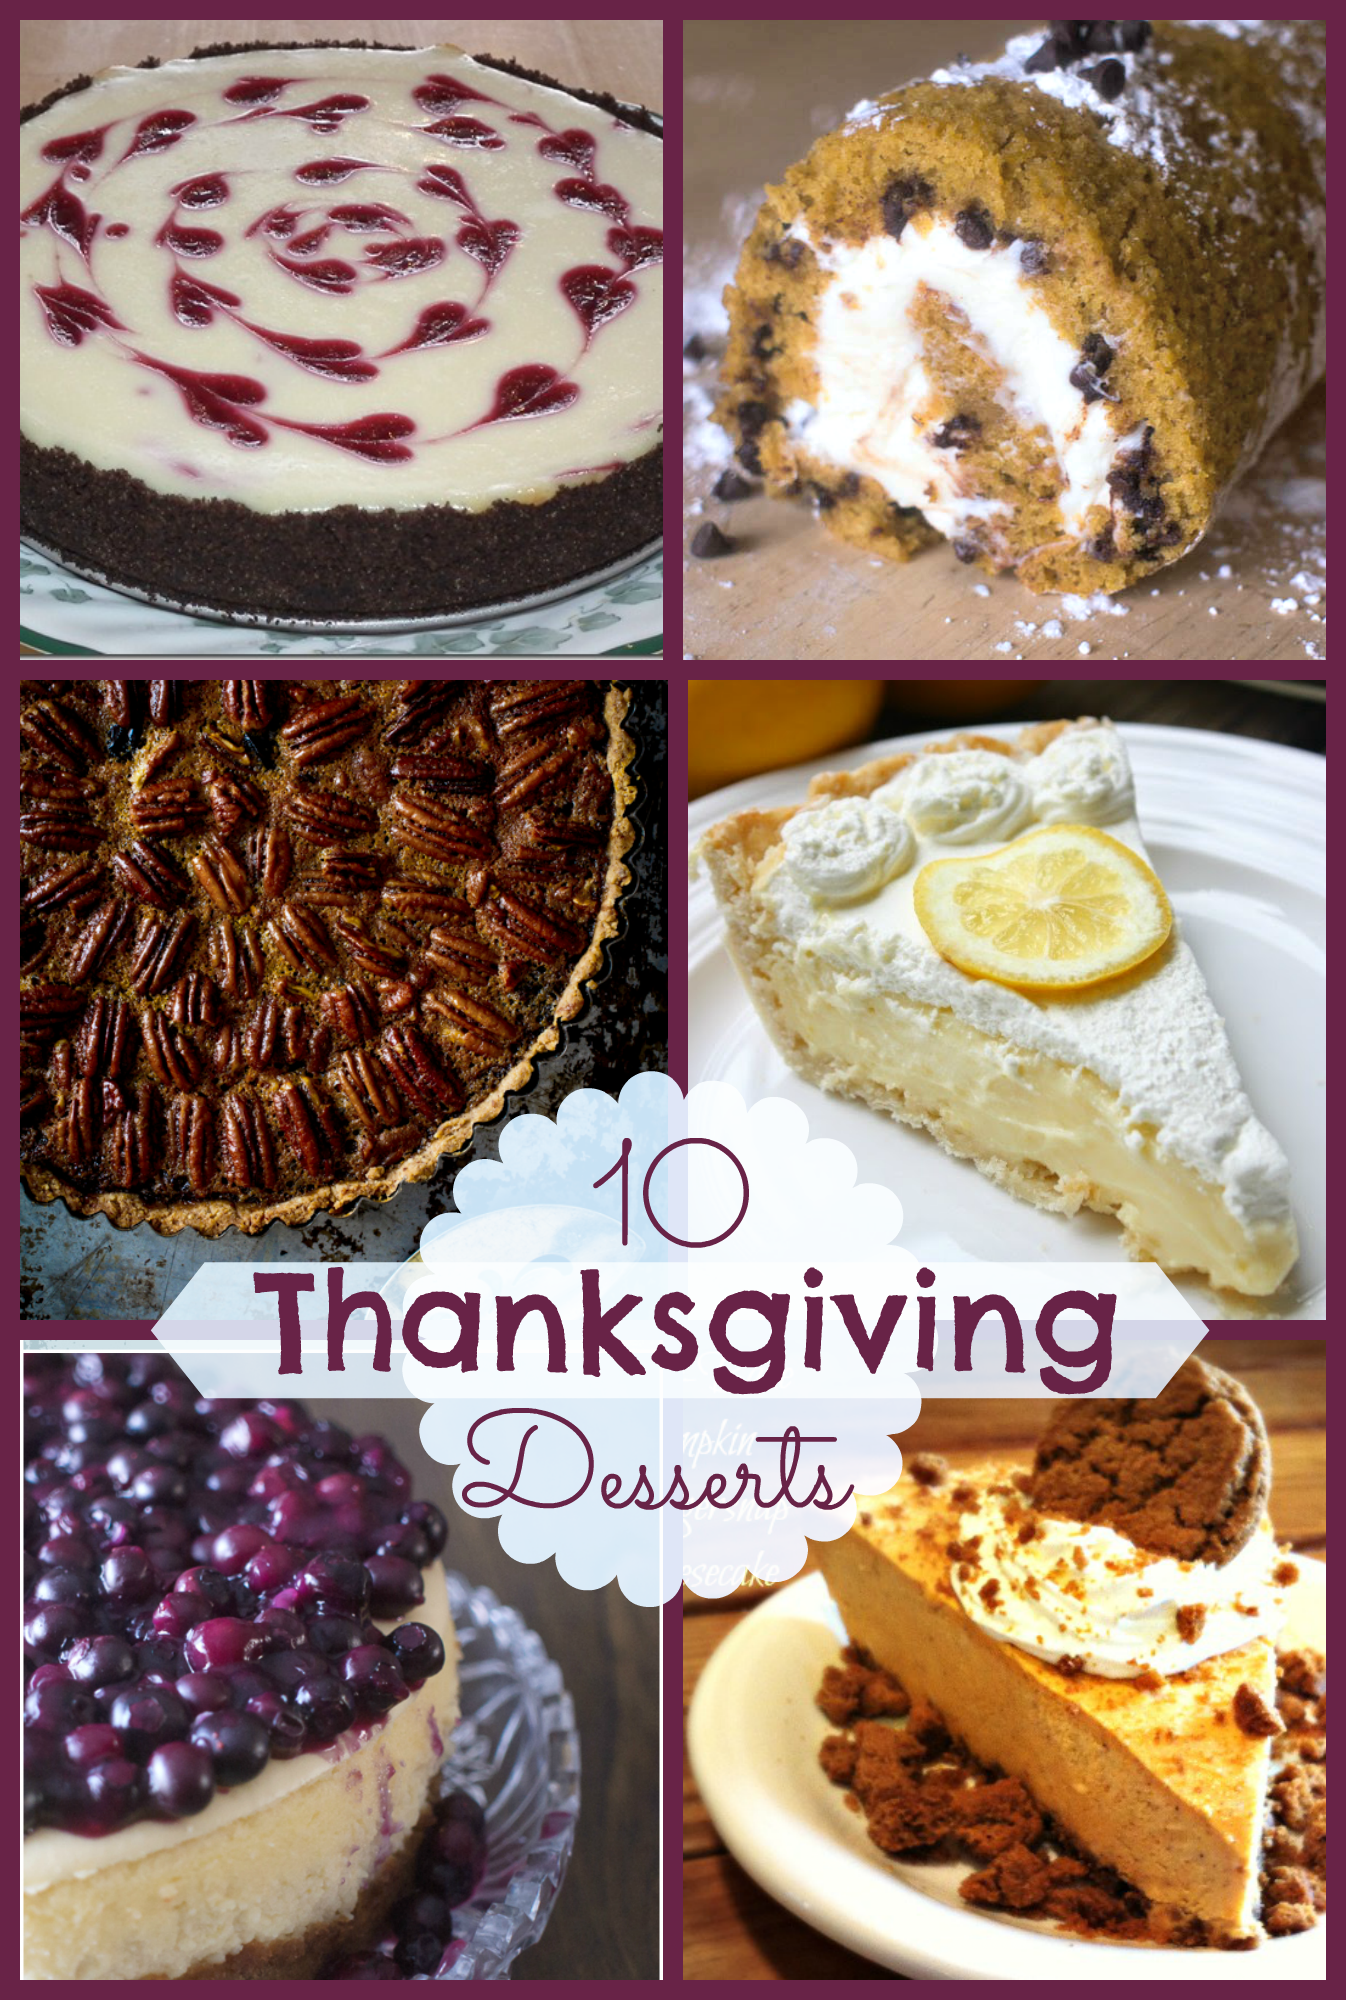 10 Fabulous Thanksgiving Desserts